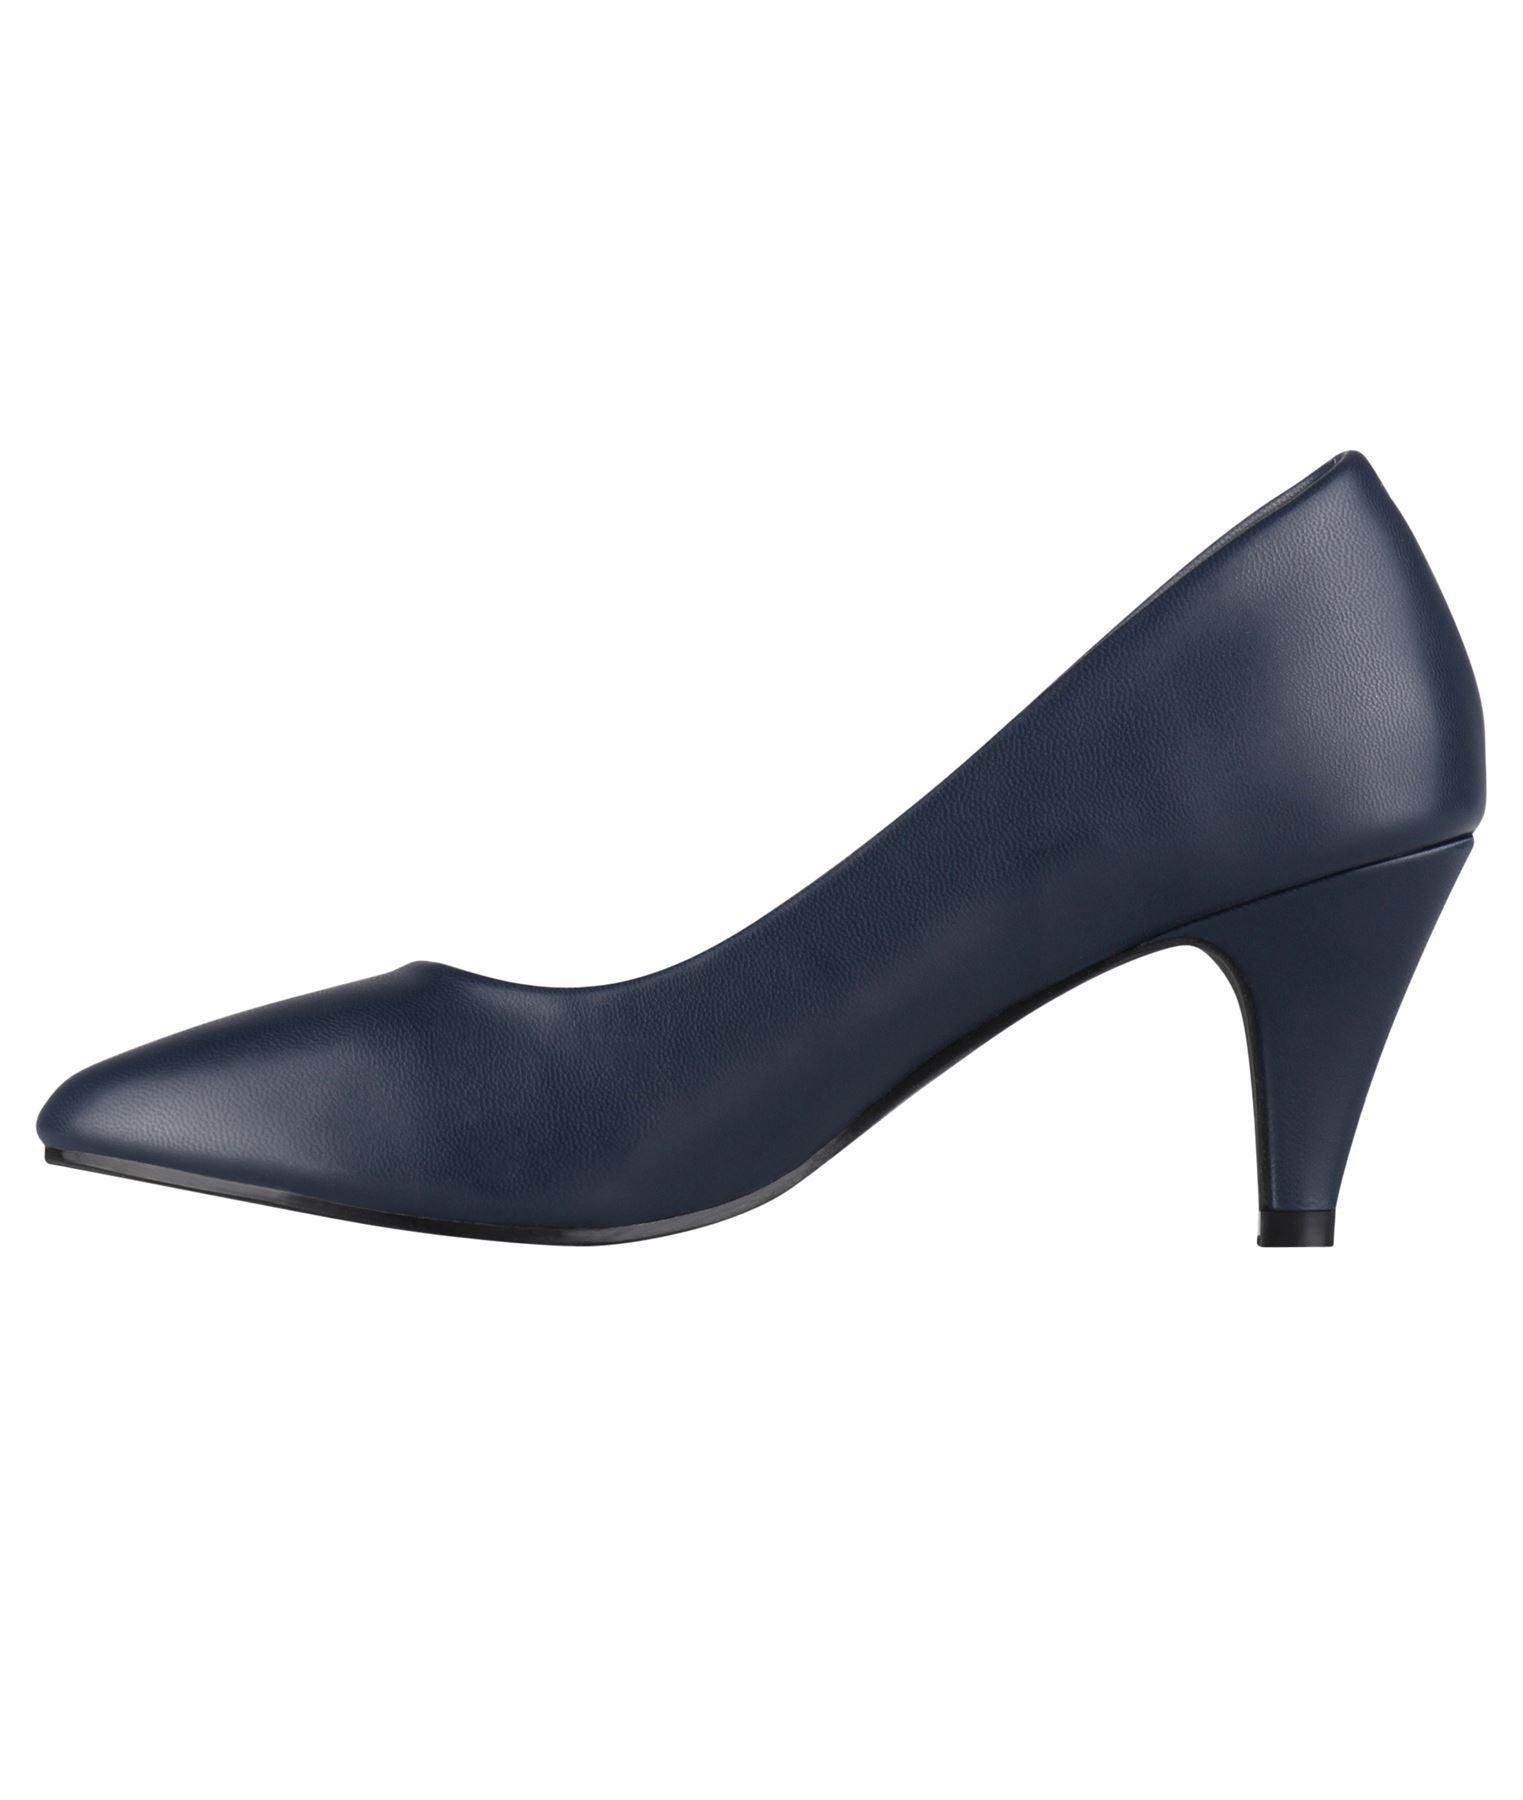 Womens-Ladies-Mid-Heel-Court-Shoes-Slip-On-Low-Kitten-Heels-Pumps-Matte-Size-3-8 thumbnail 16